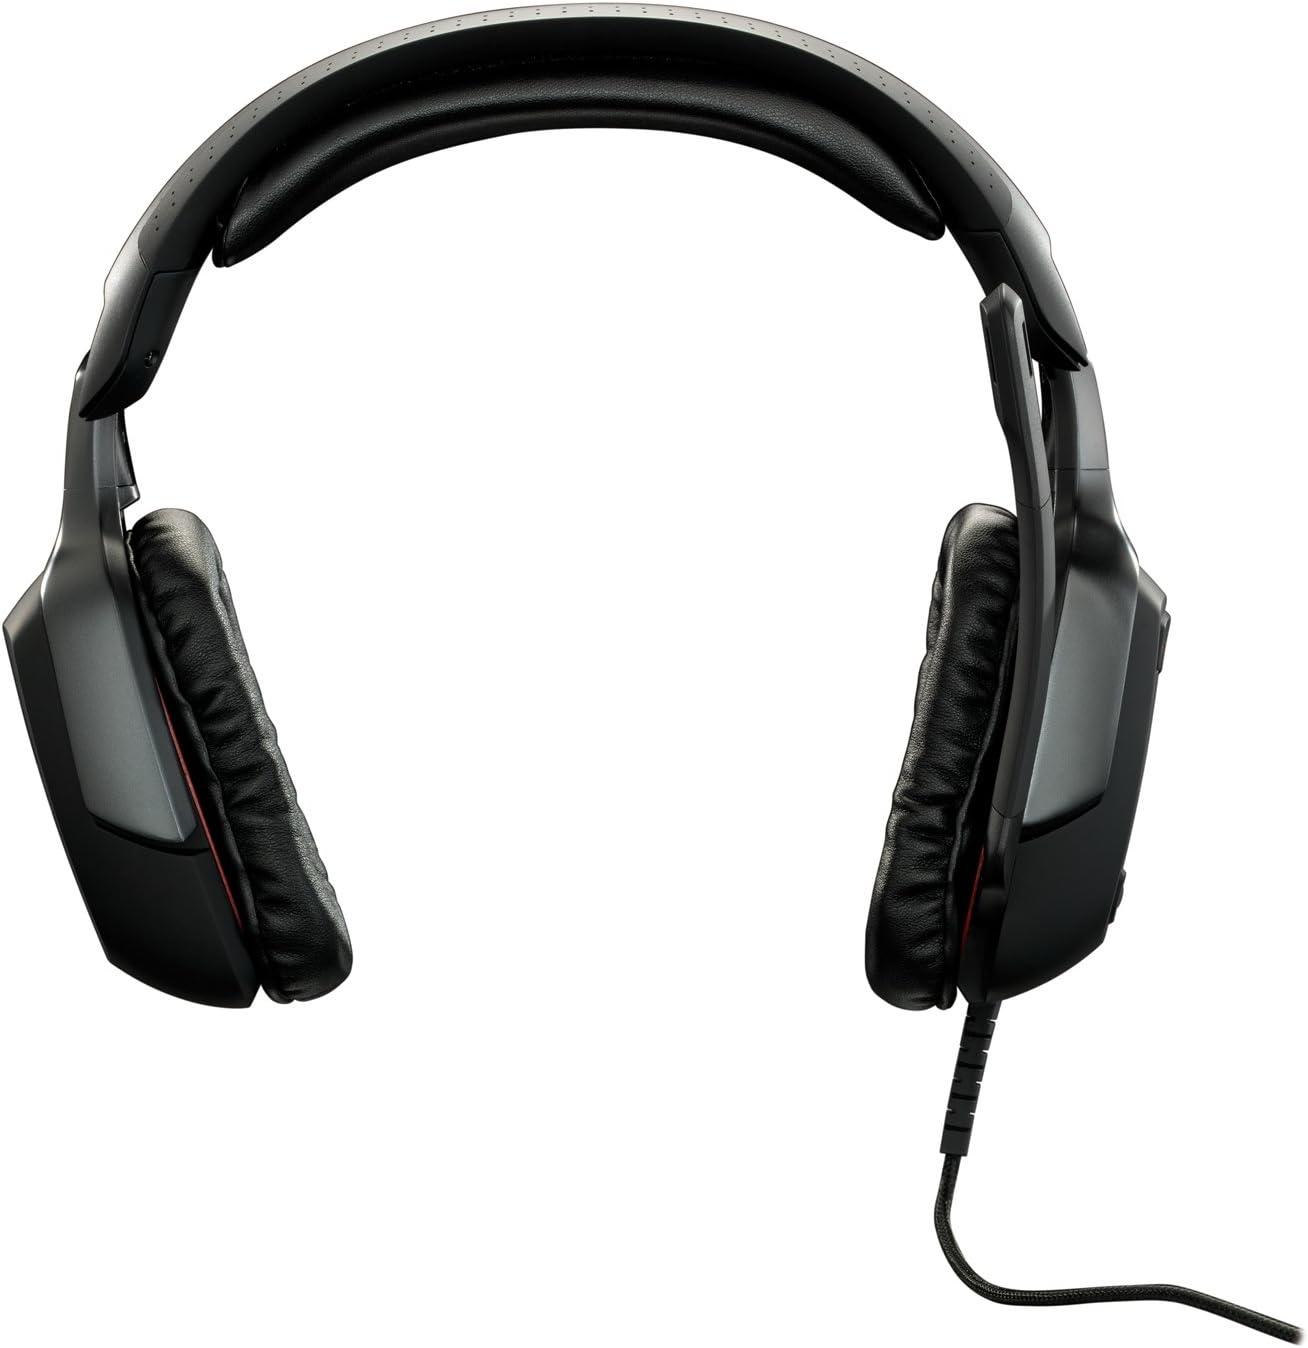 The Logitech G35 Headsets